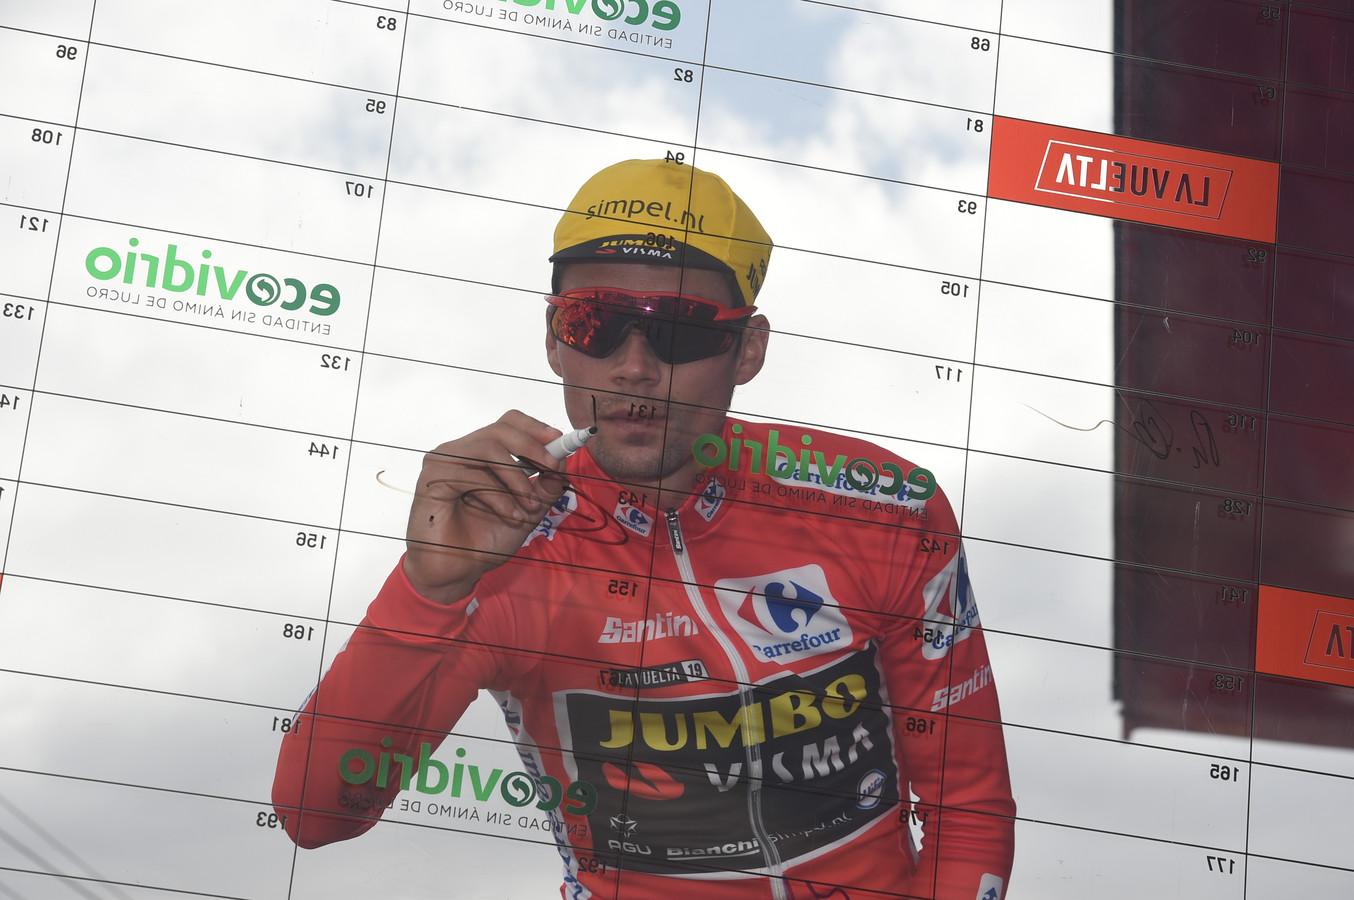 13-09-2019 Vuelta A Espana; Tappa 19 Avila - Toledo; 2019, Jumbo - Visma; Roglic, Primoz; Avila;